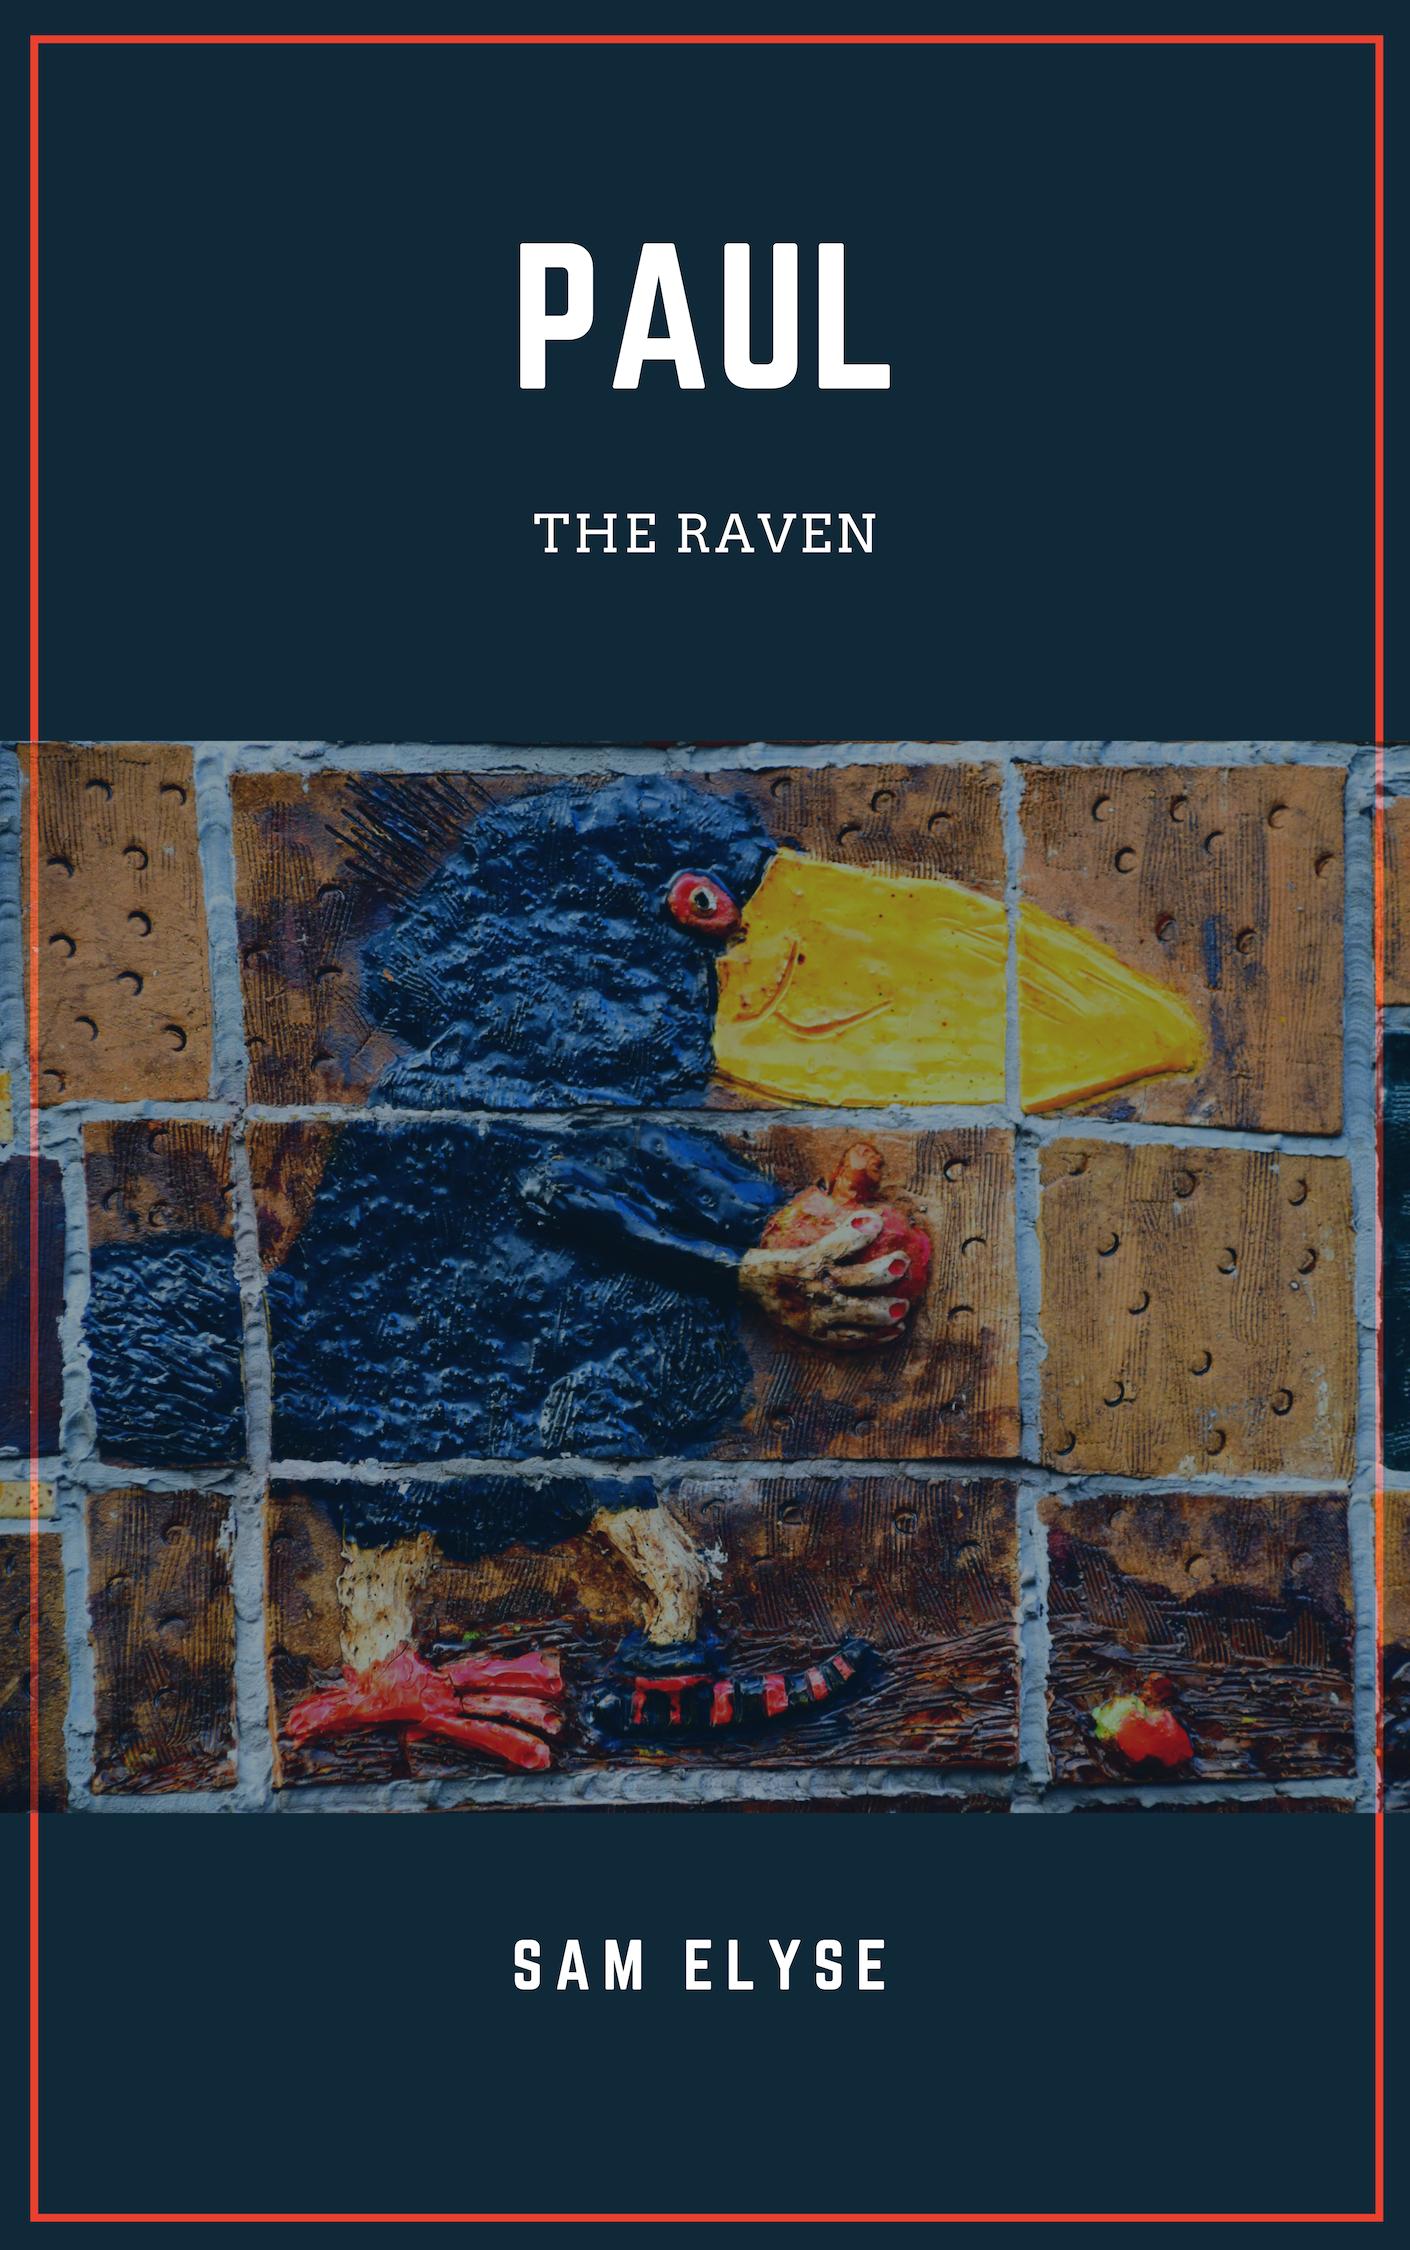 Paul the Raven